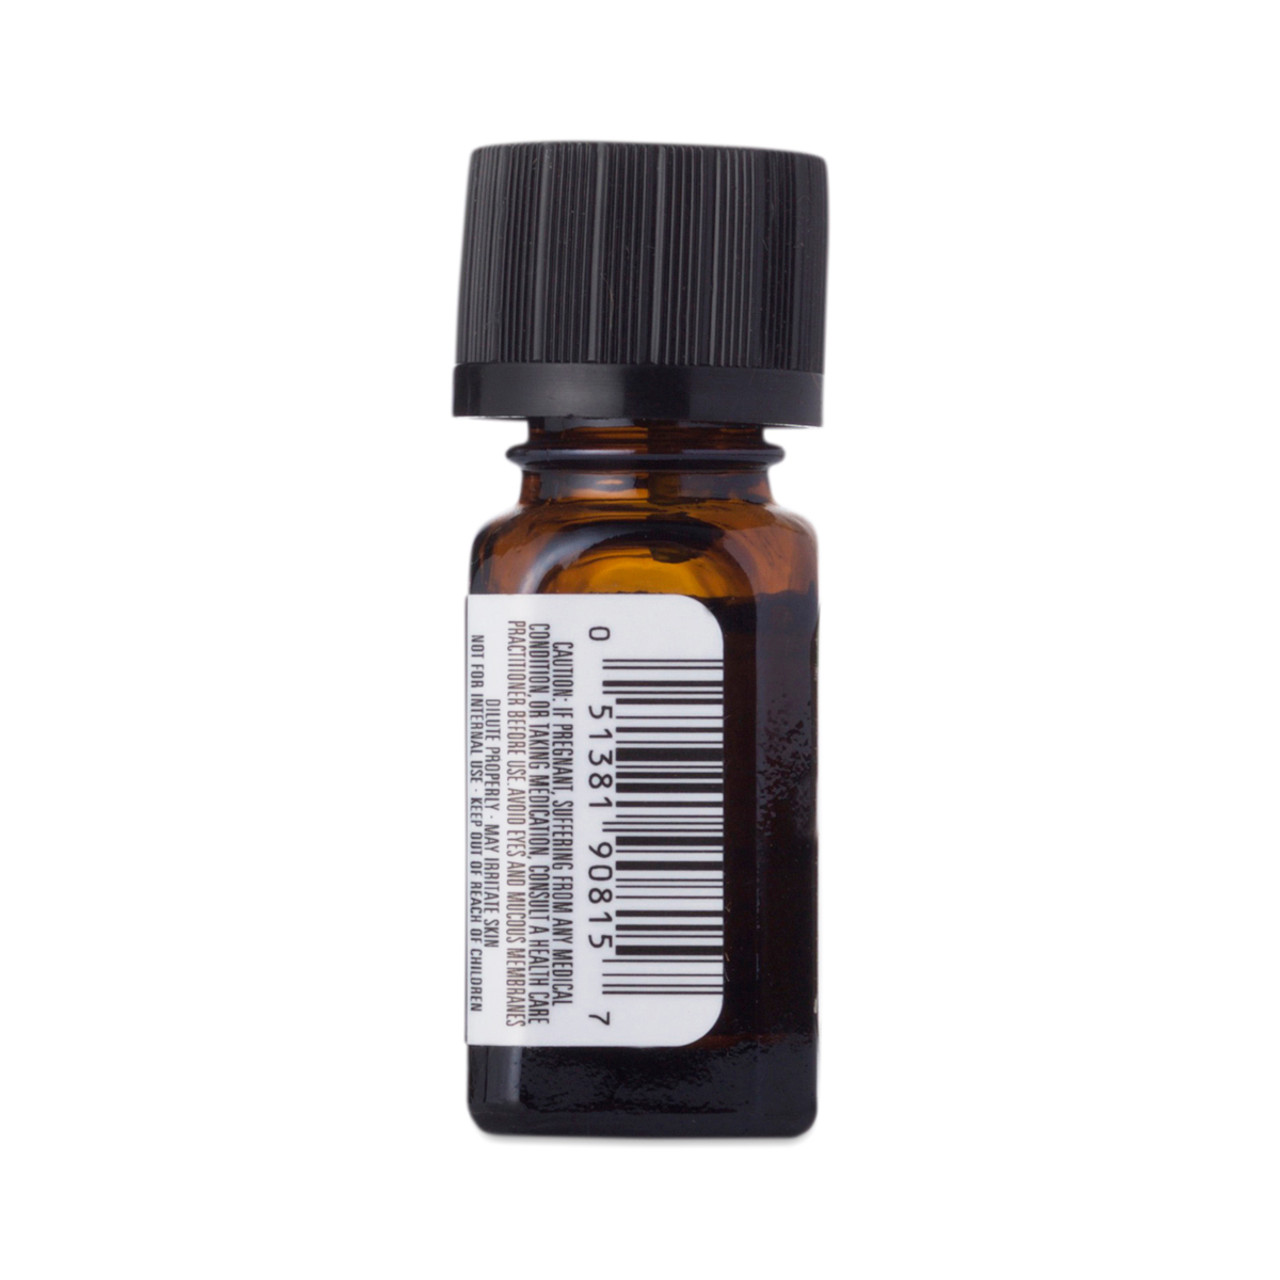 Lemongrass essential oil - bee swarm attractant